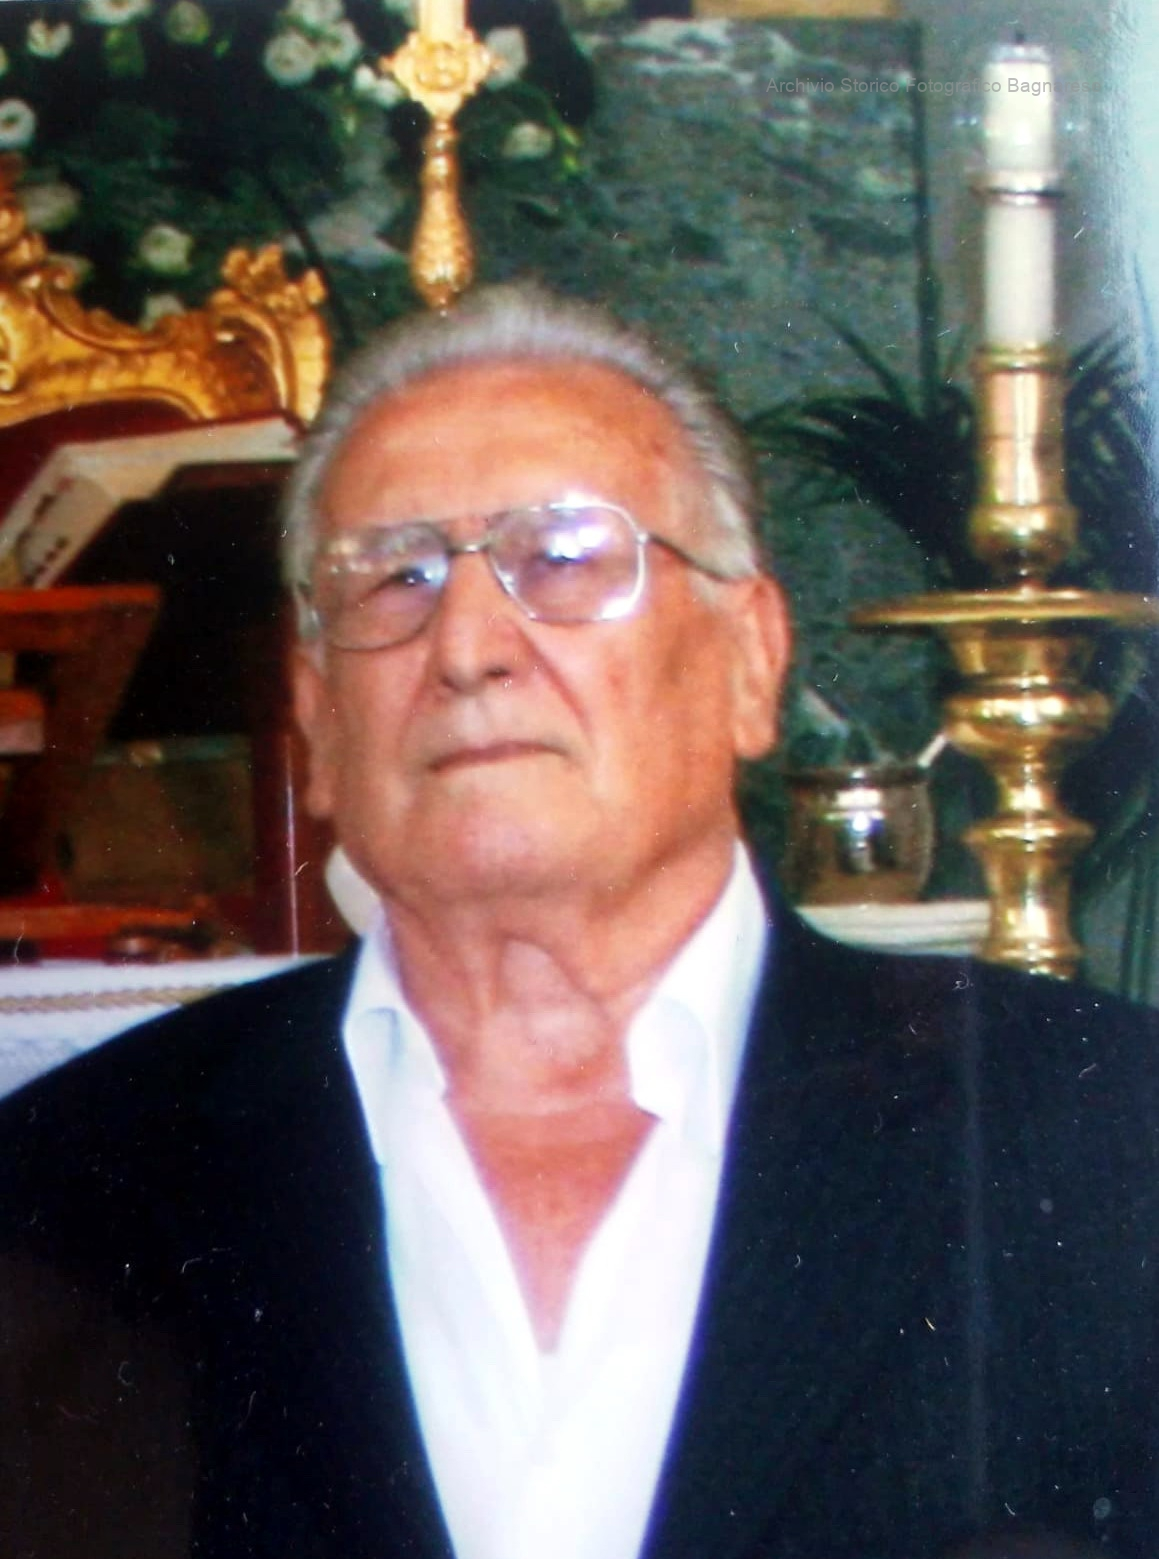 bagnara Francesco Cannatella